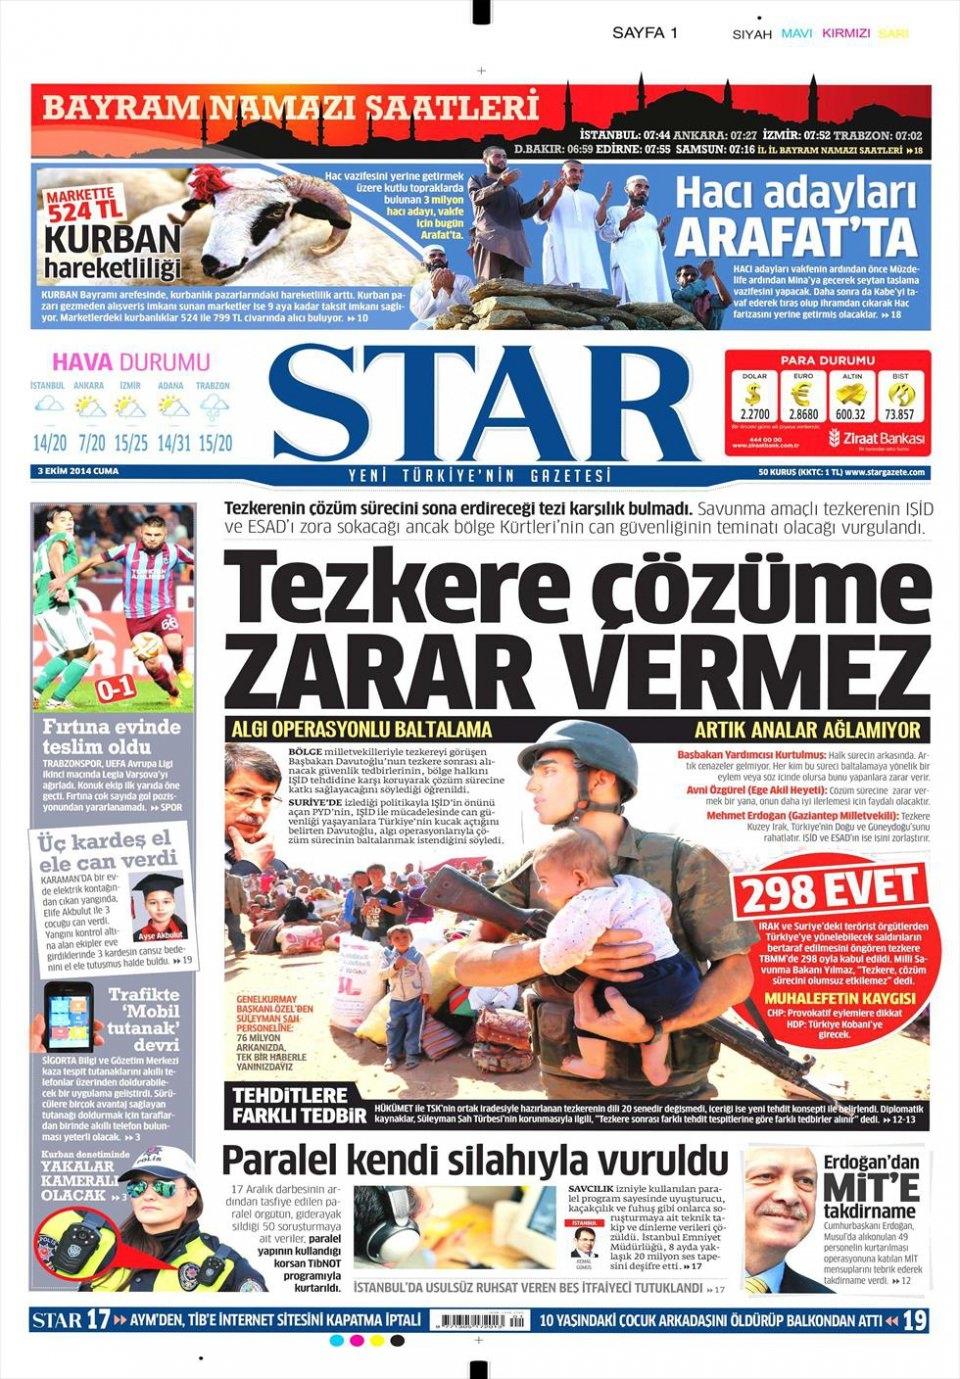 3 Ekim 2014 gazete manşetleri 17